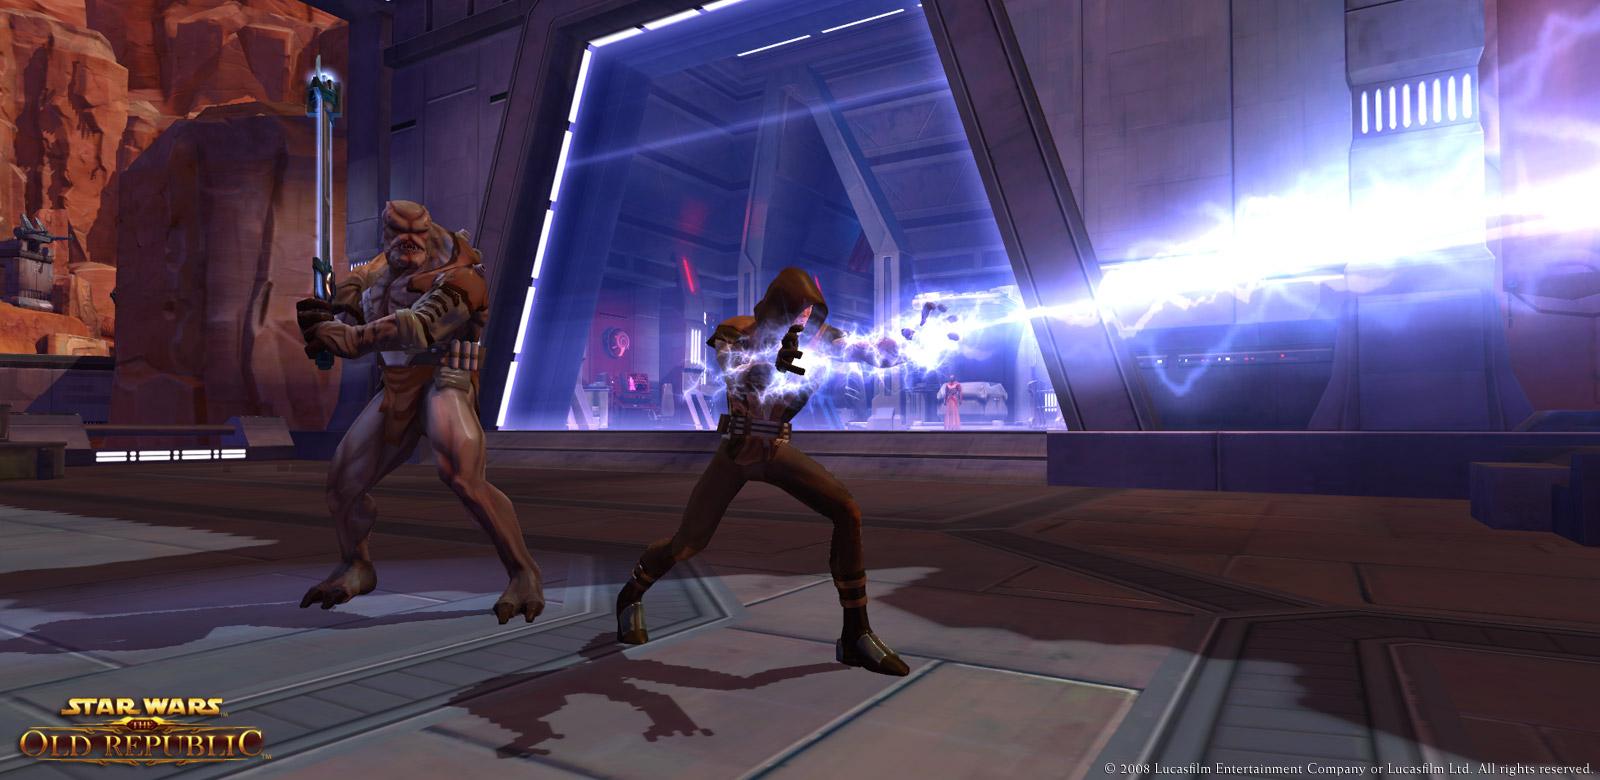 Abilities | Star Wars: The Old Republic Wiki | FANDOM powered by Wikia